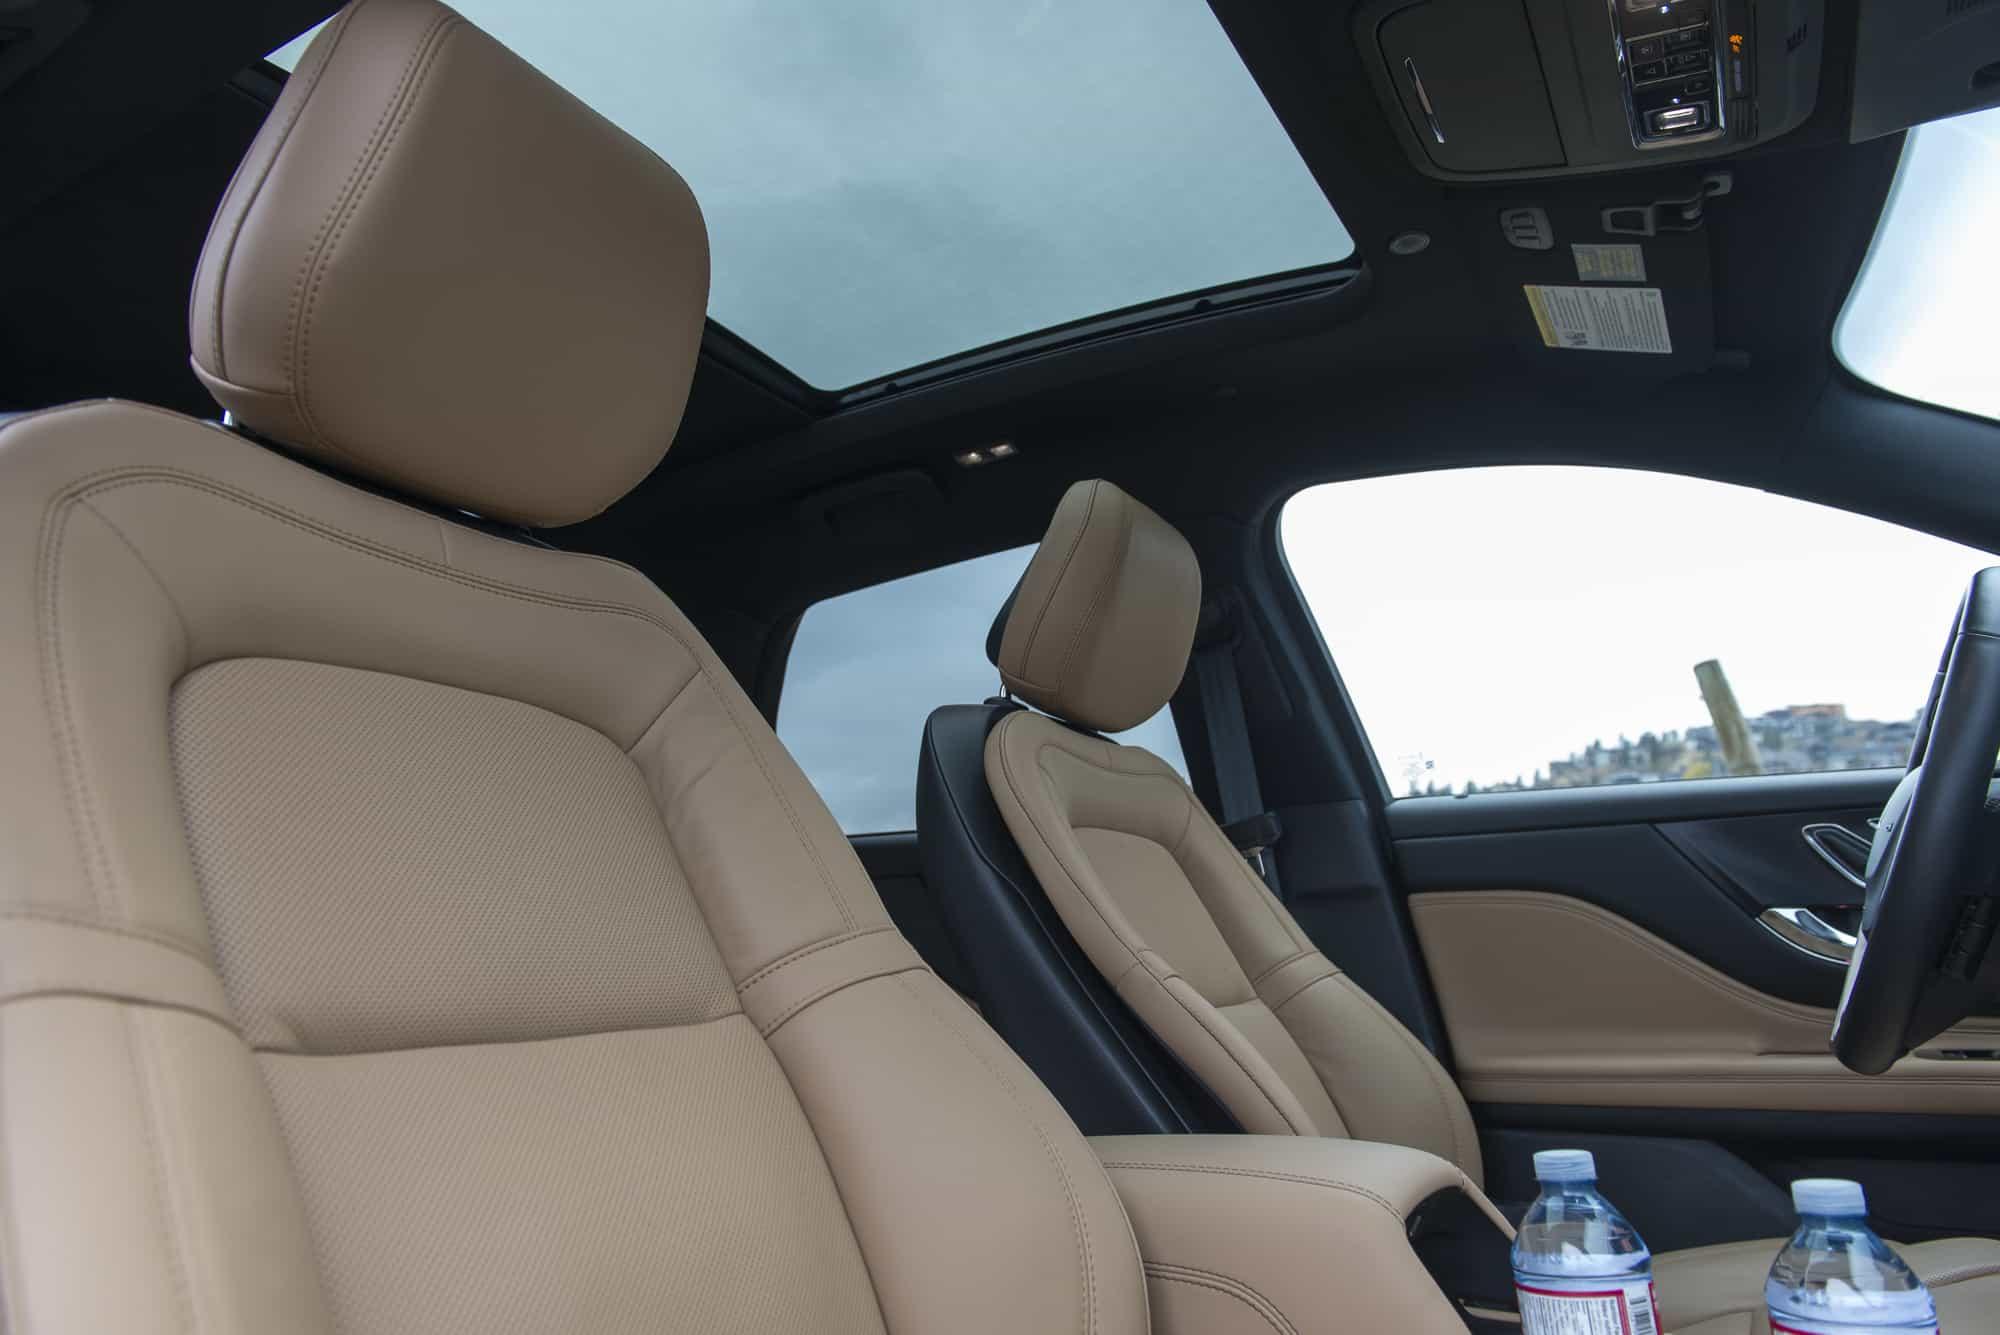 2020 LIncoln Corsair interior seats